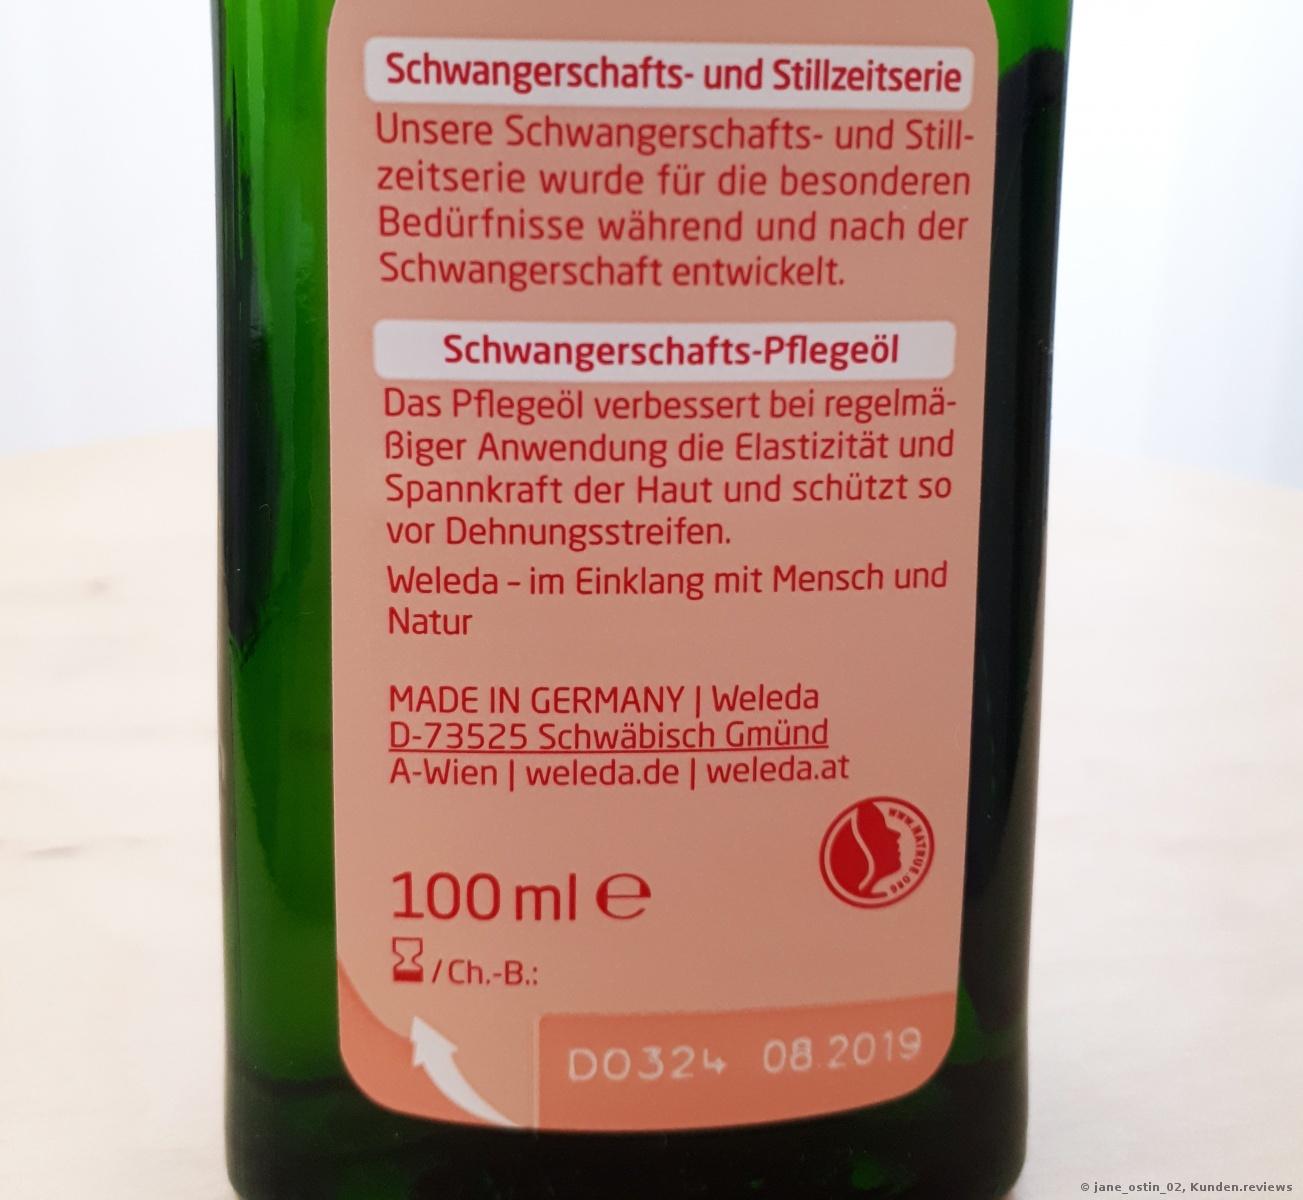 Weleda Schwangerschafts-Pflegeöl Foto